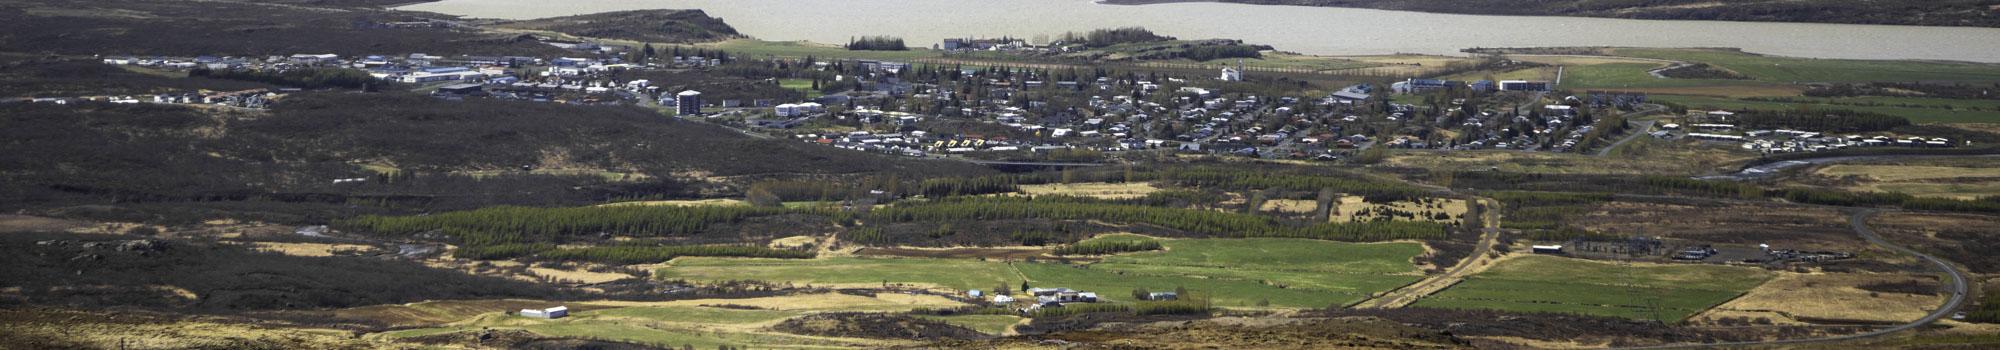 Egilsstaðir overview